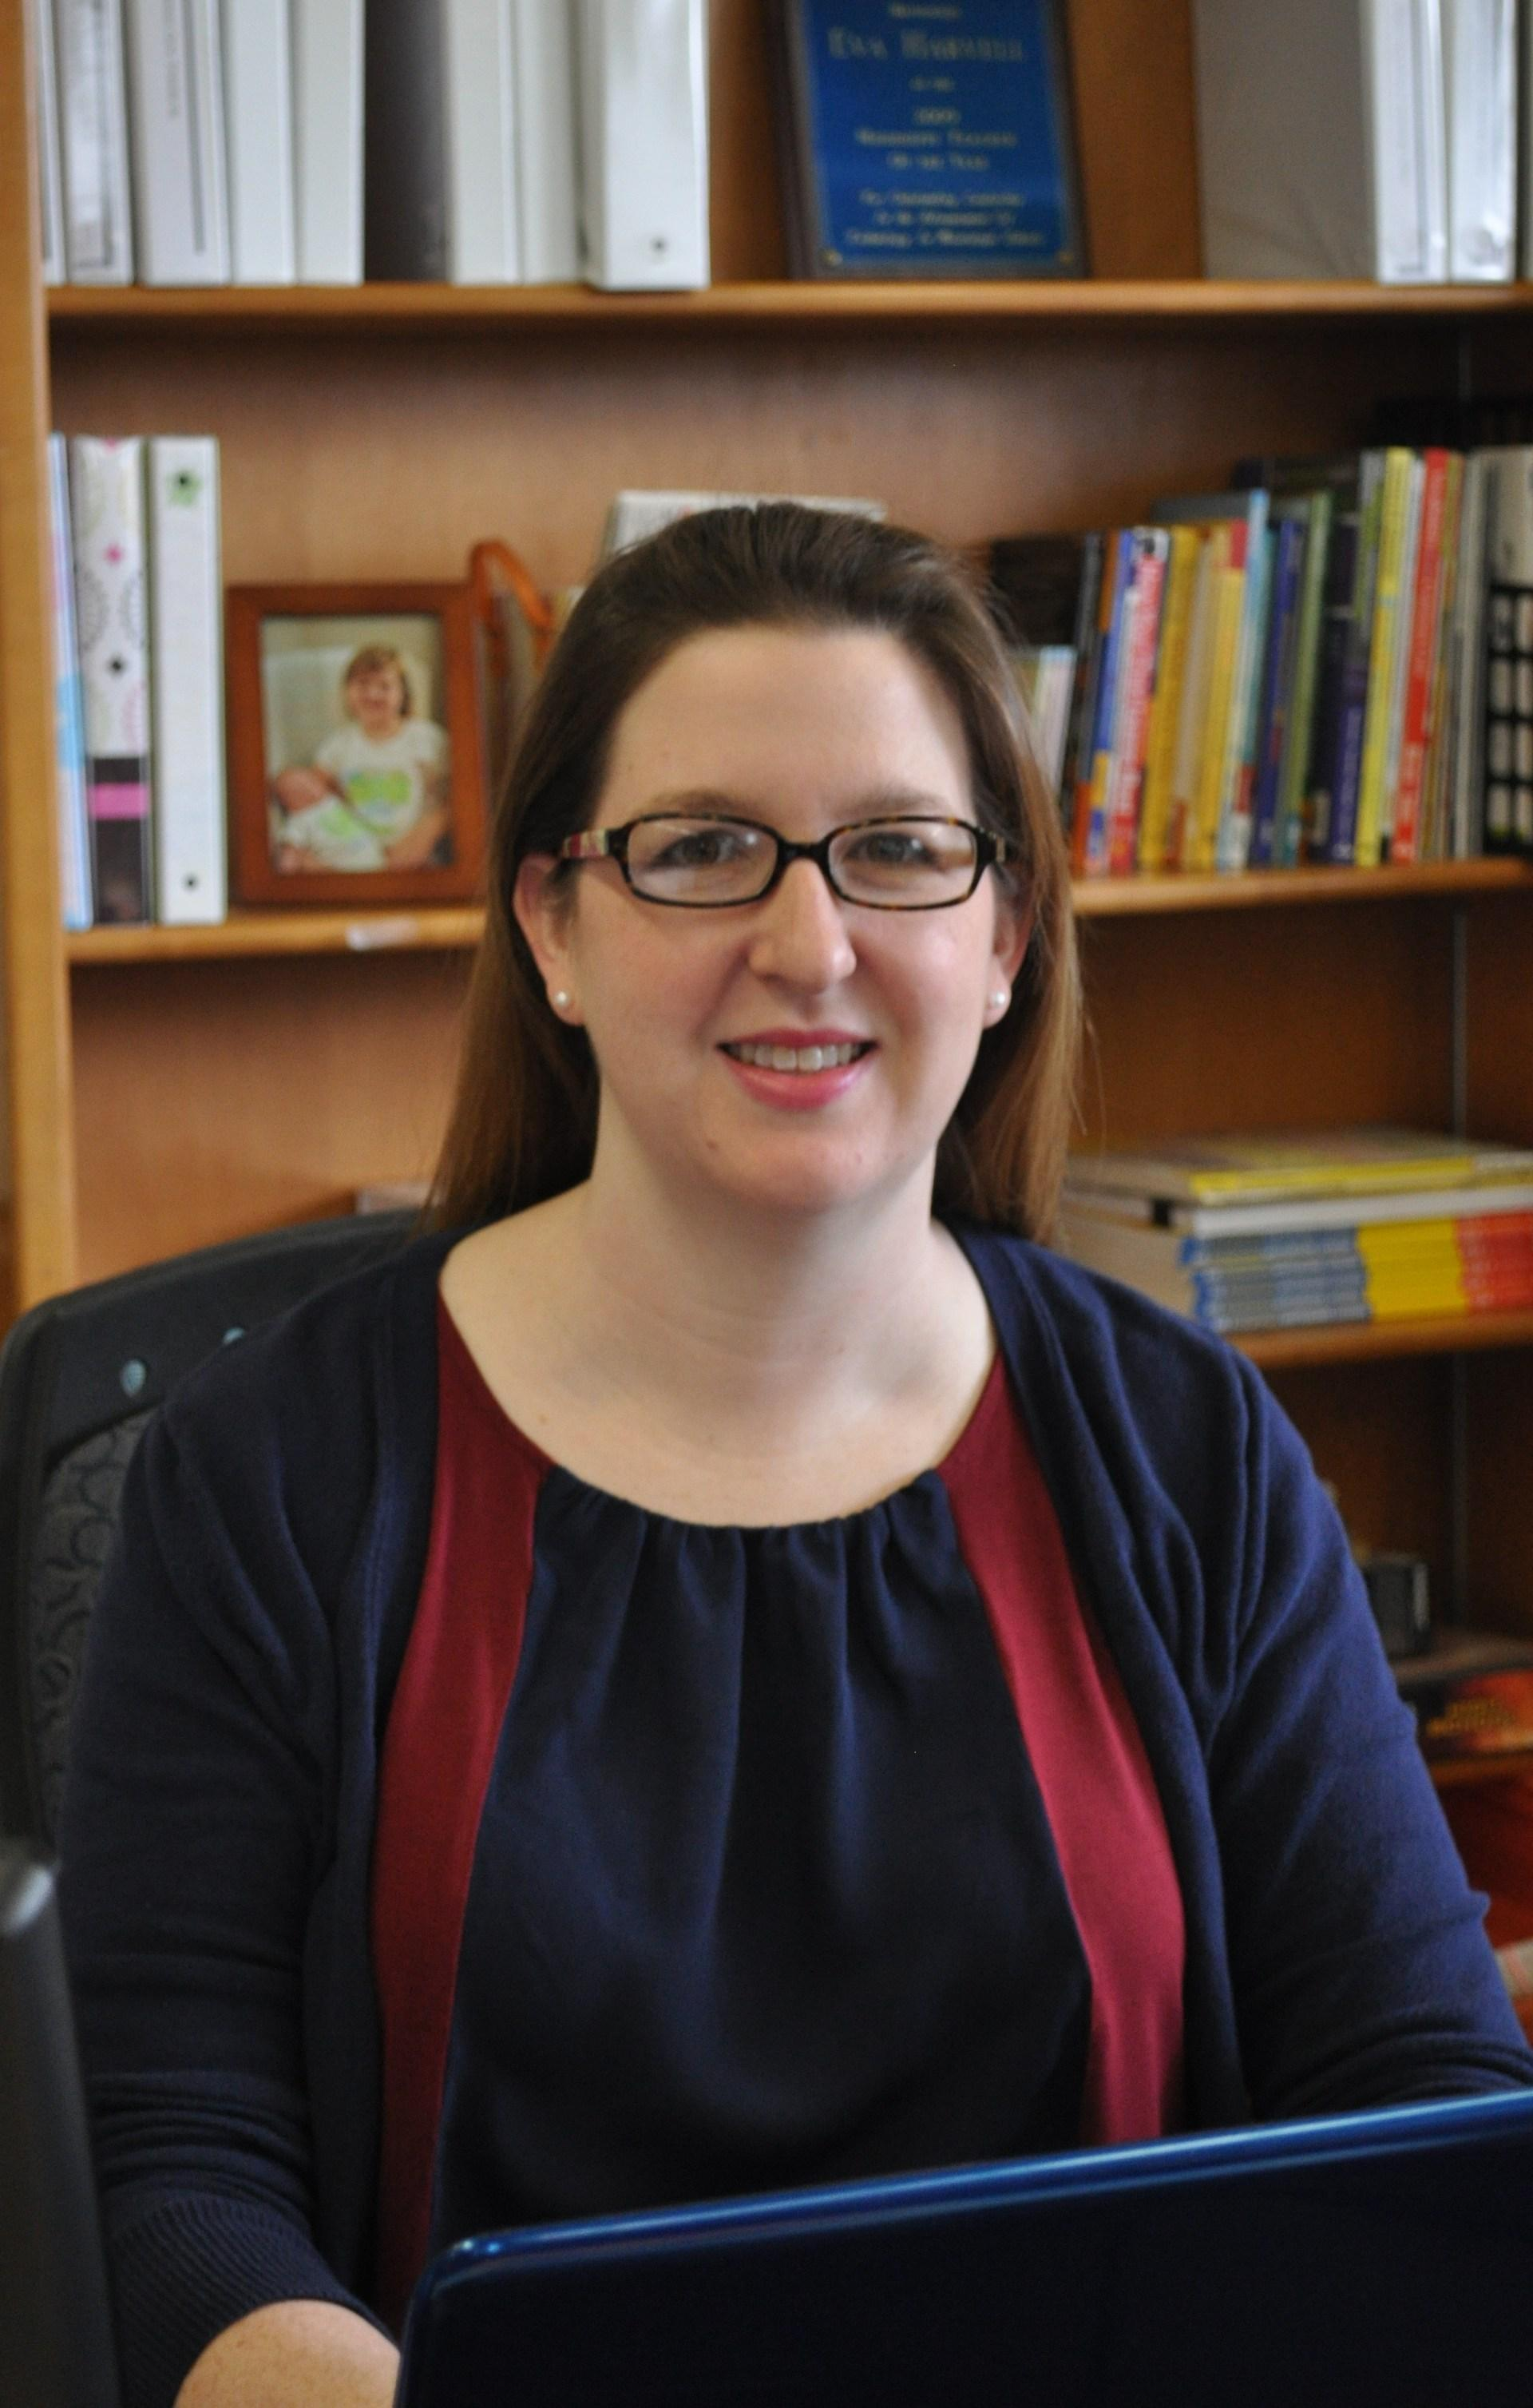 Eva Harvell, Director of Technology